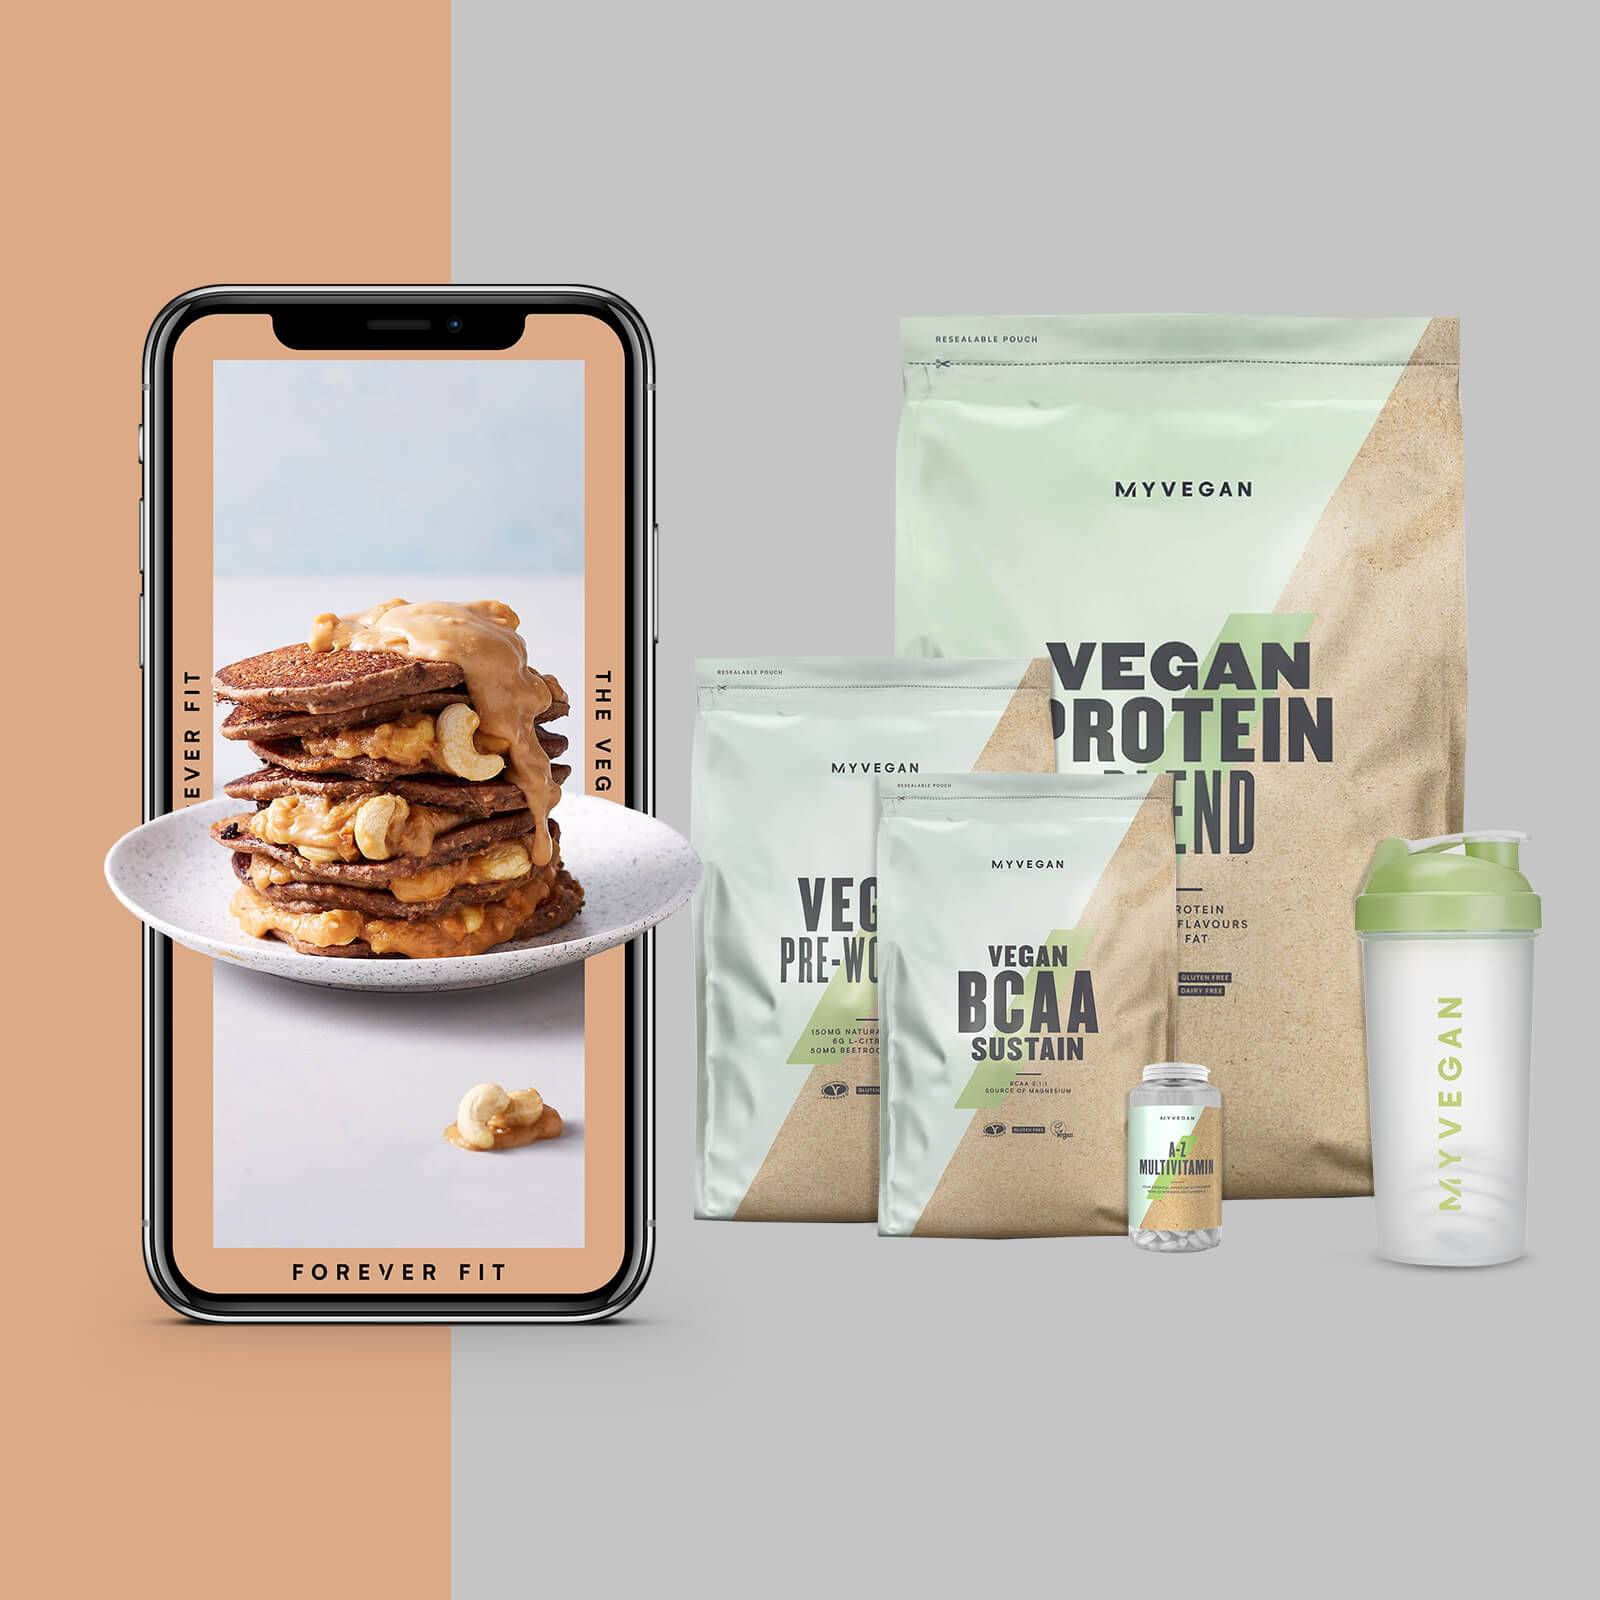 Le Pack Vegan + Guide Entraînement et Nutrition Offert - Orange - Lemon Tea - Strawberry